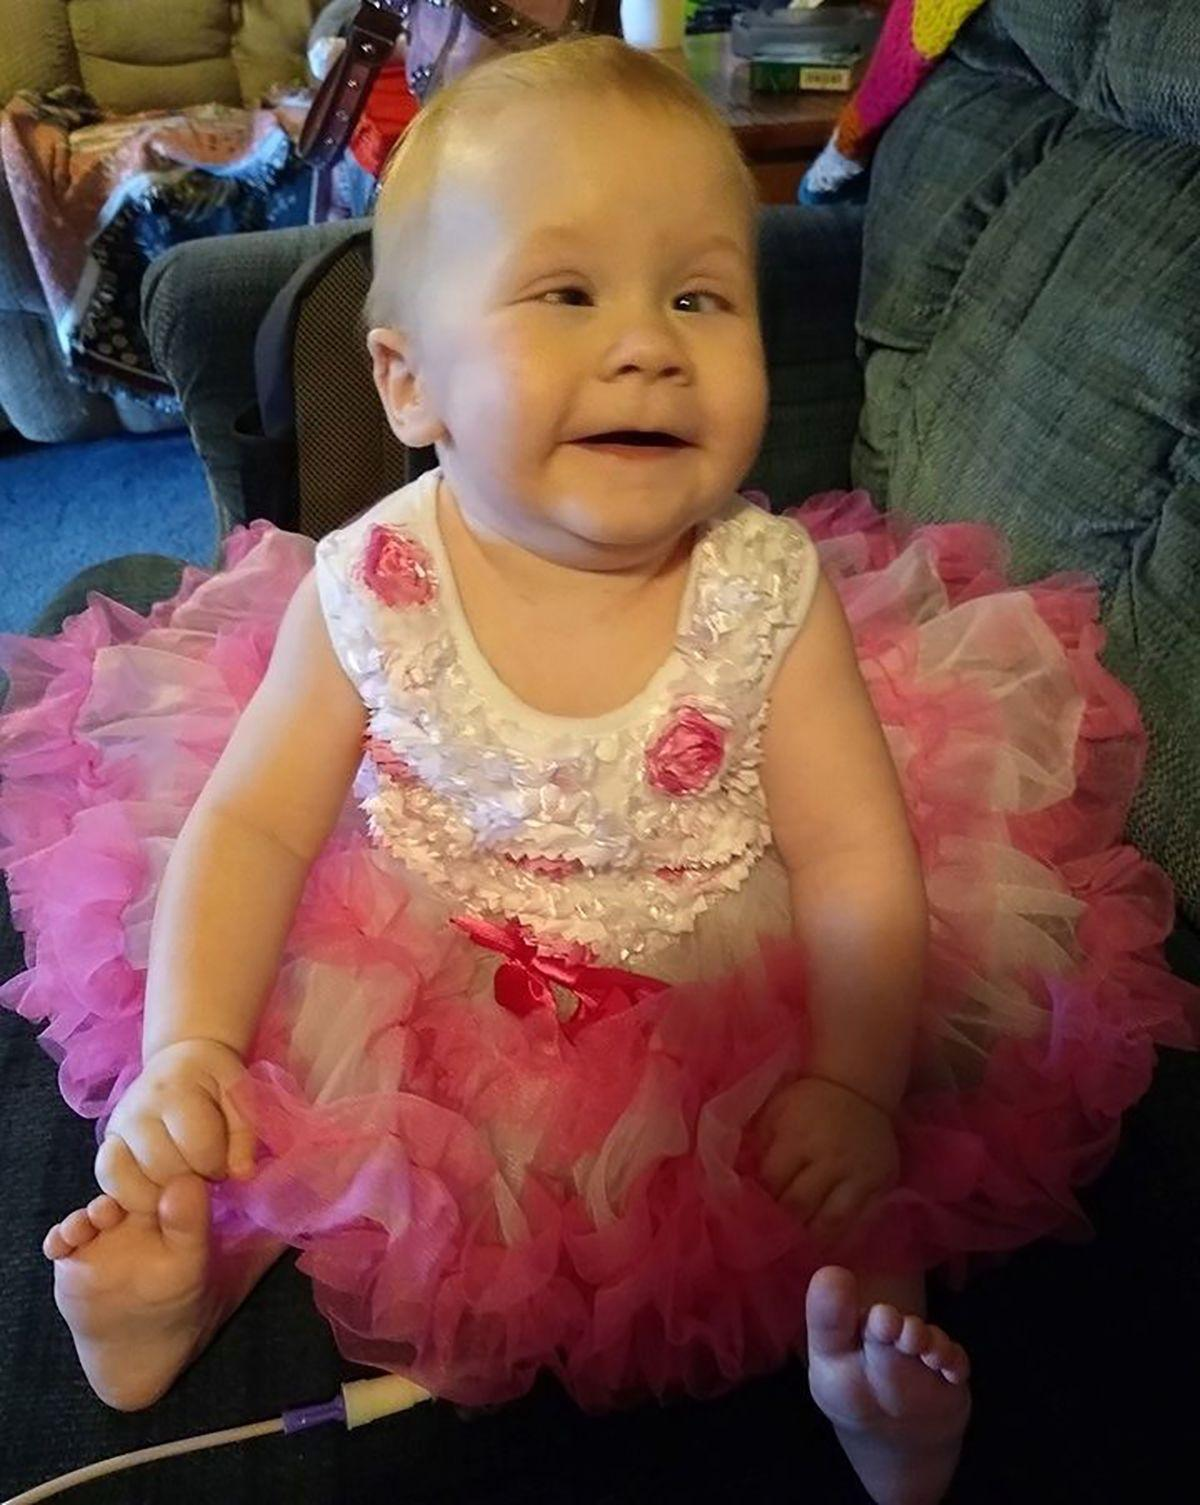 Baby Di'laine Marie Gaucher Disease 1st birthday